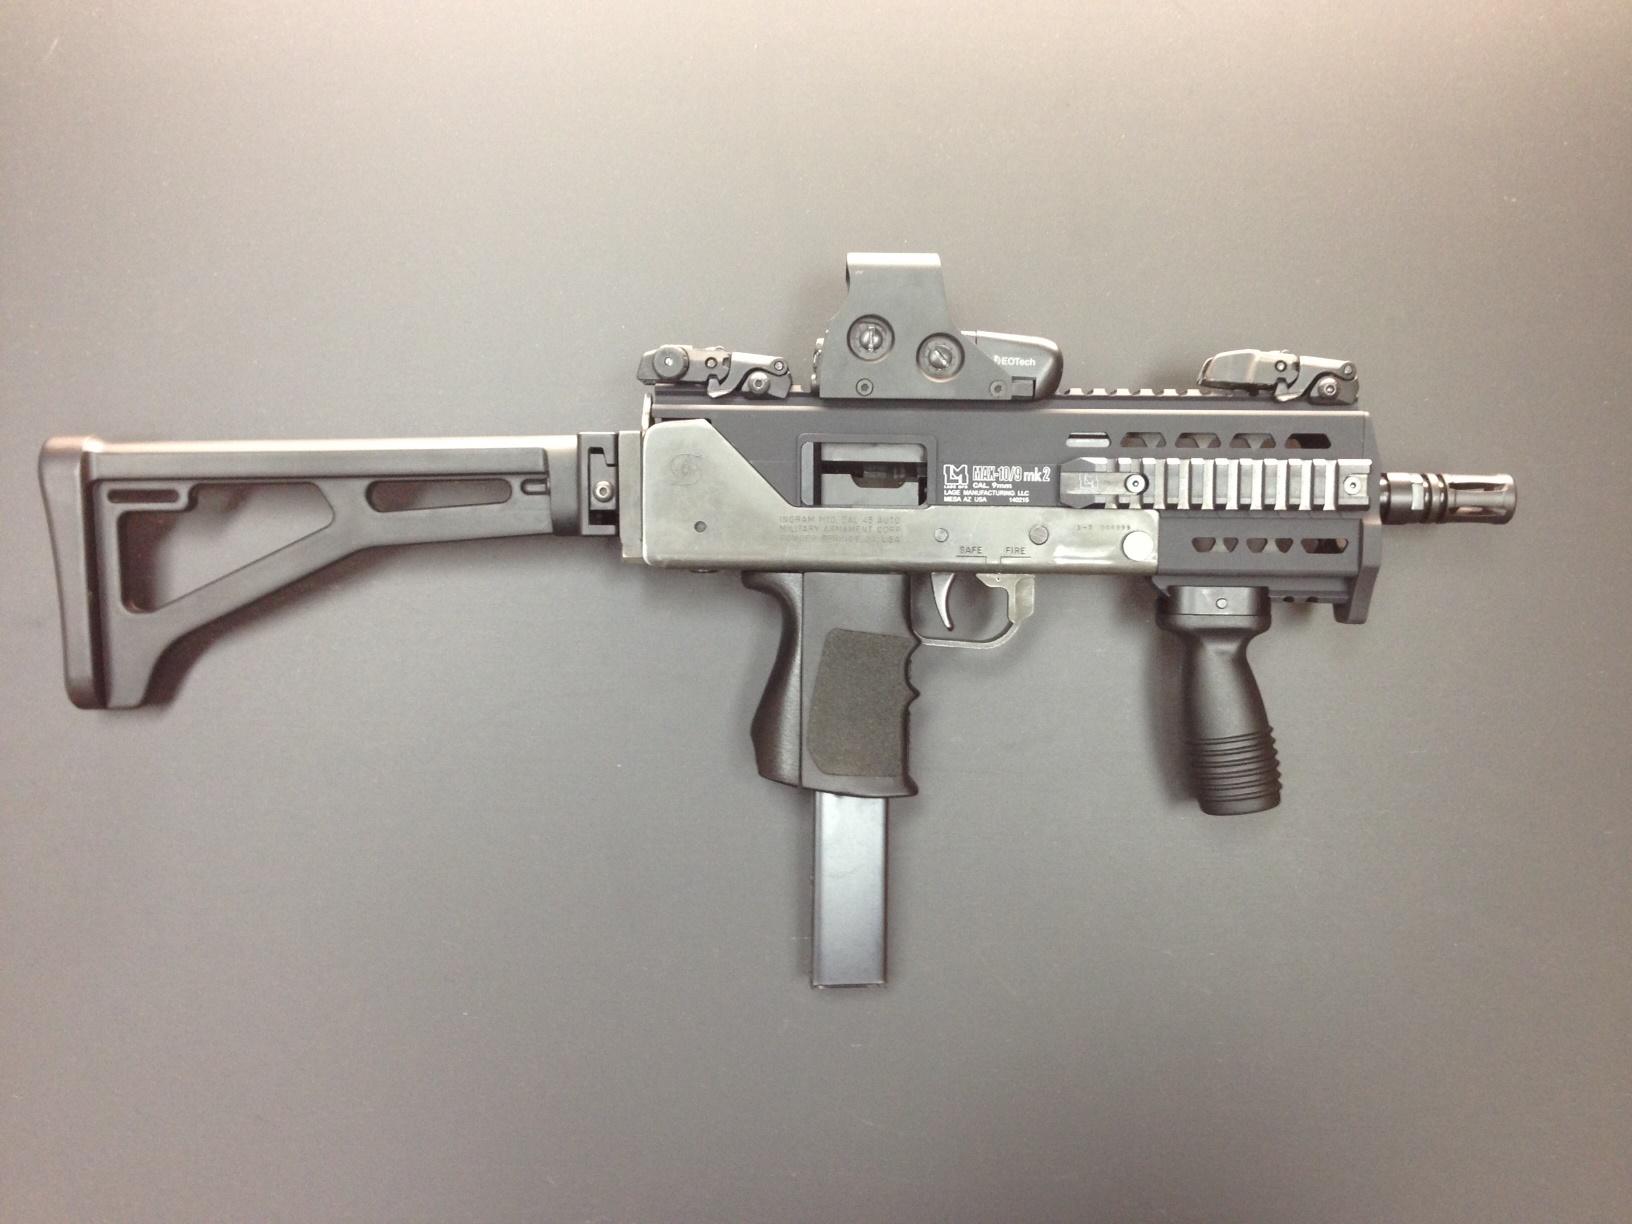 MAX-10 mk2 Upper Receiver and Accessories